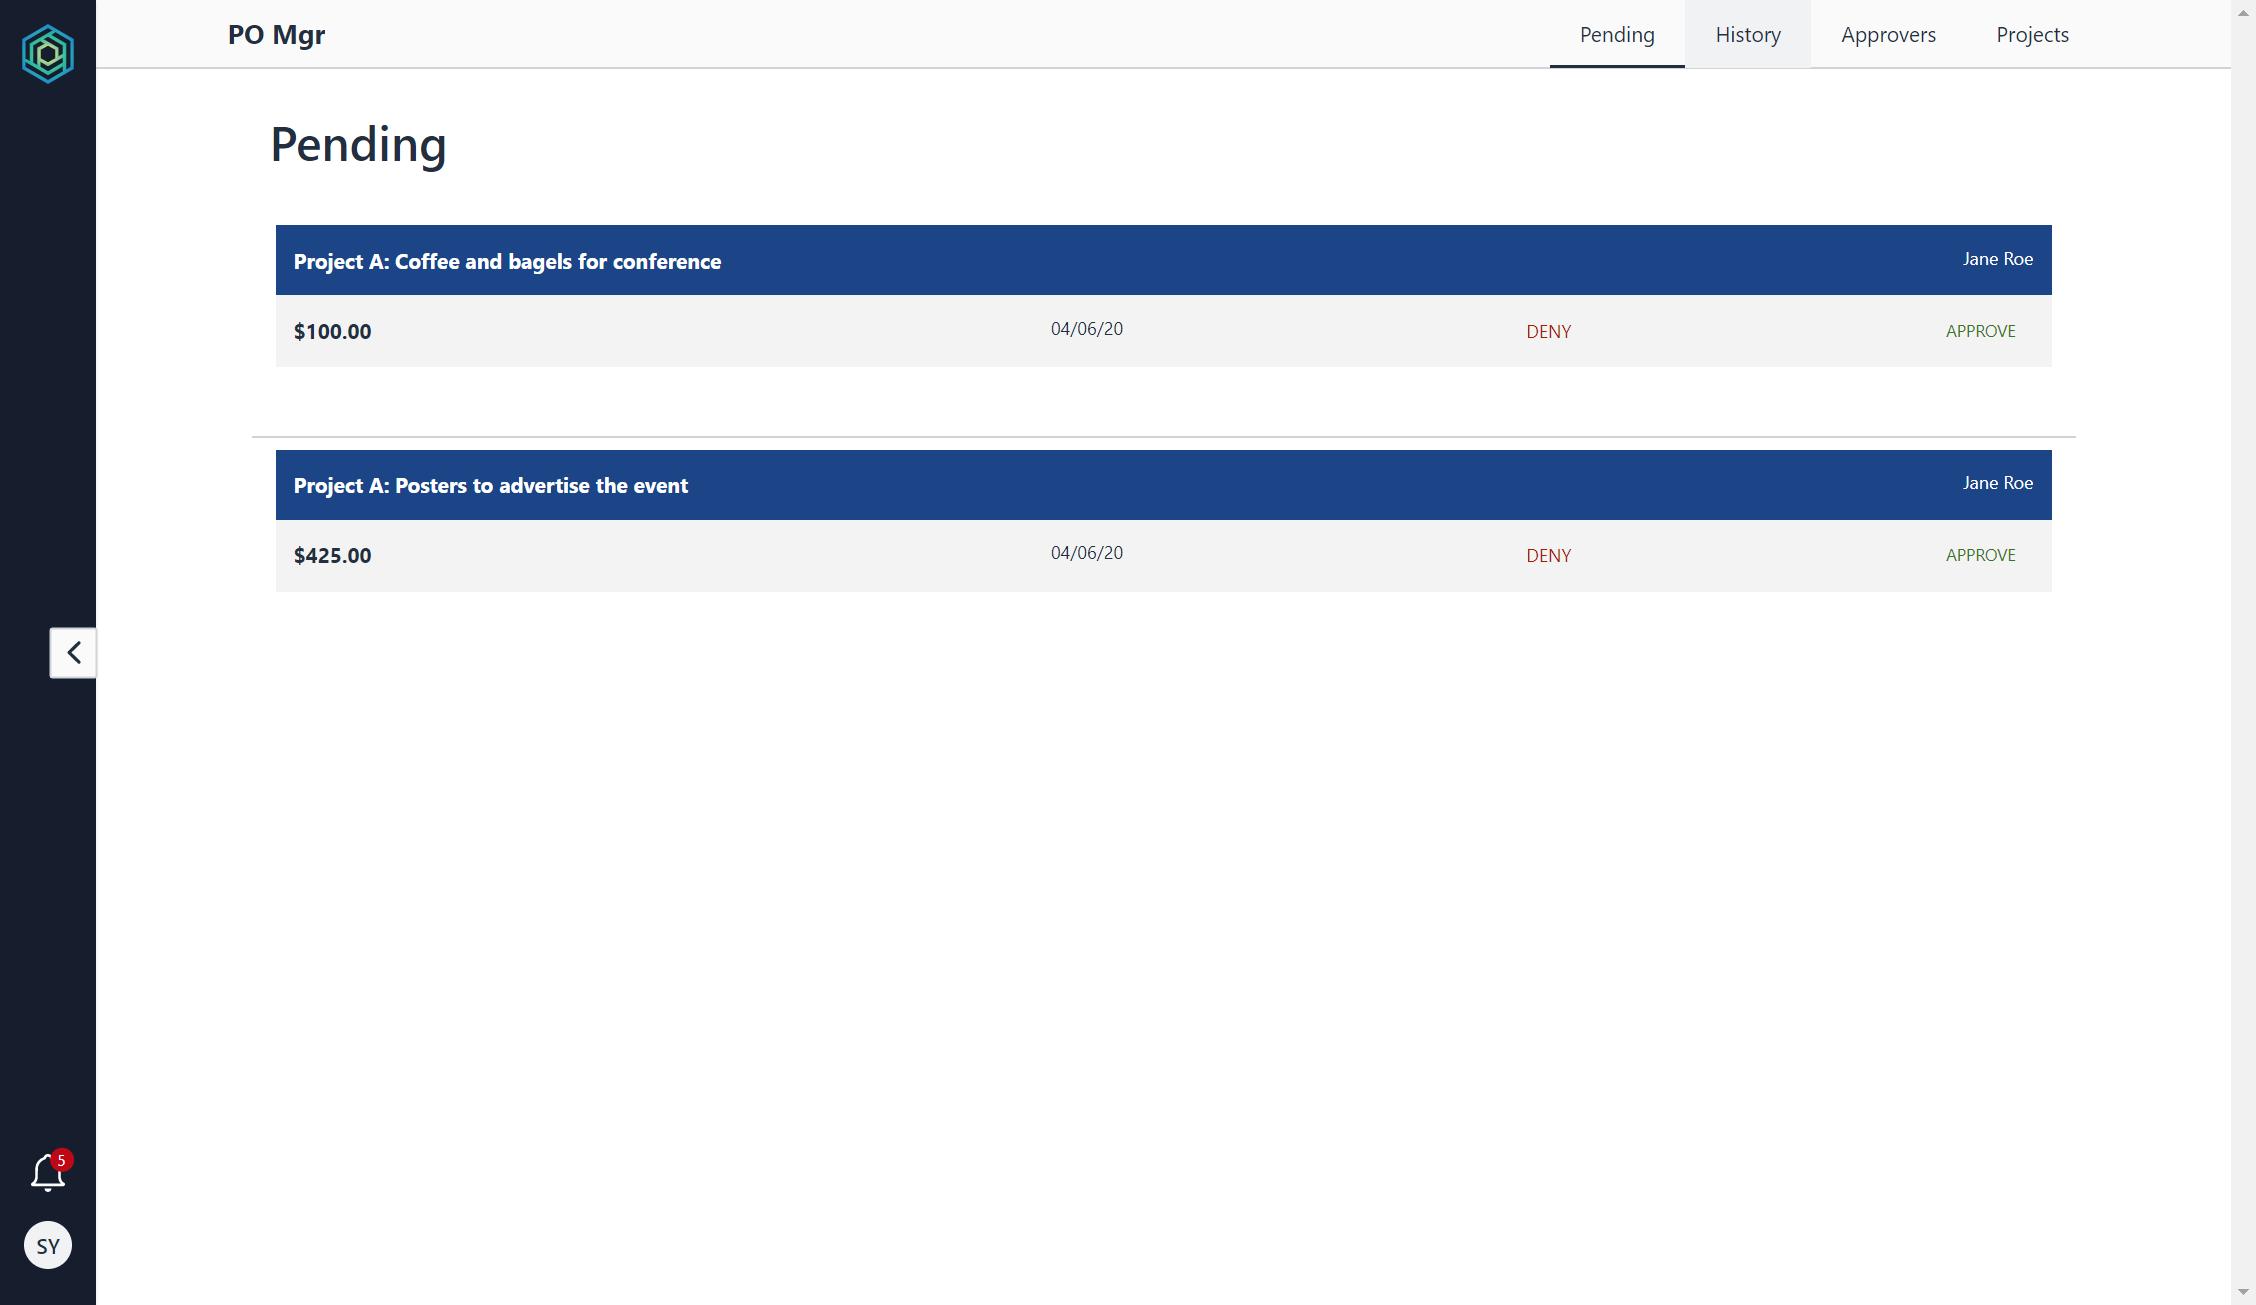 screenshot-app.honeycode.aws-2020.06.28-18_43_25.png